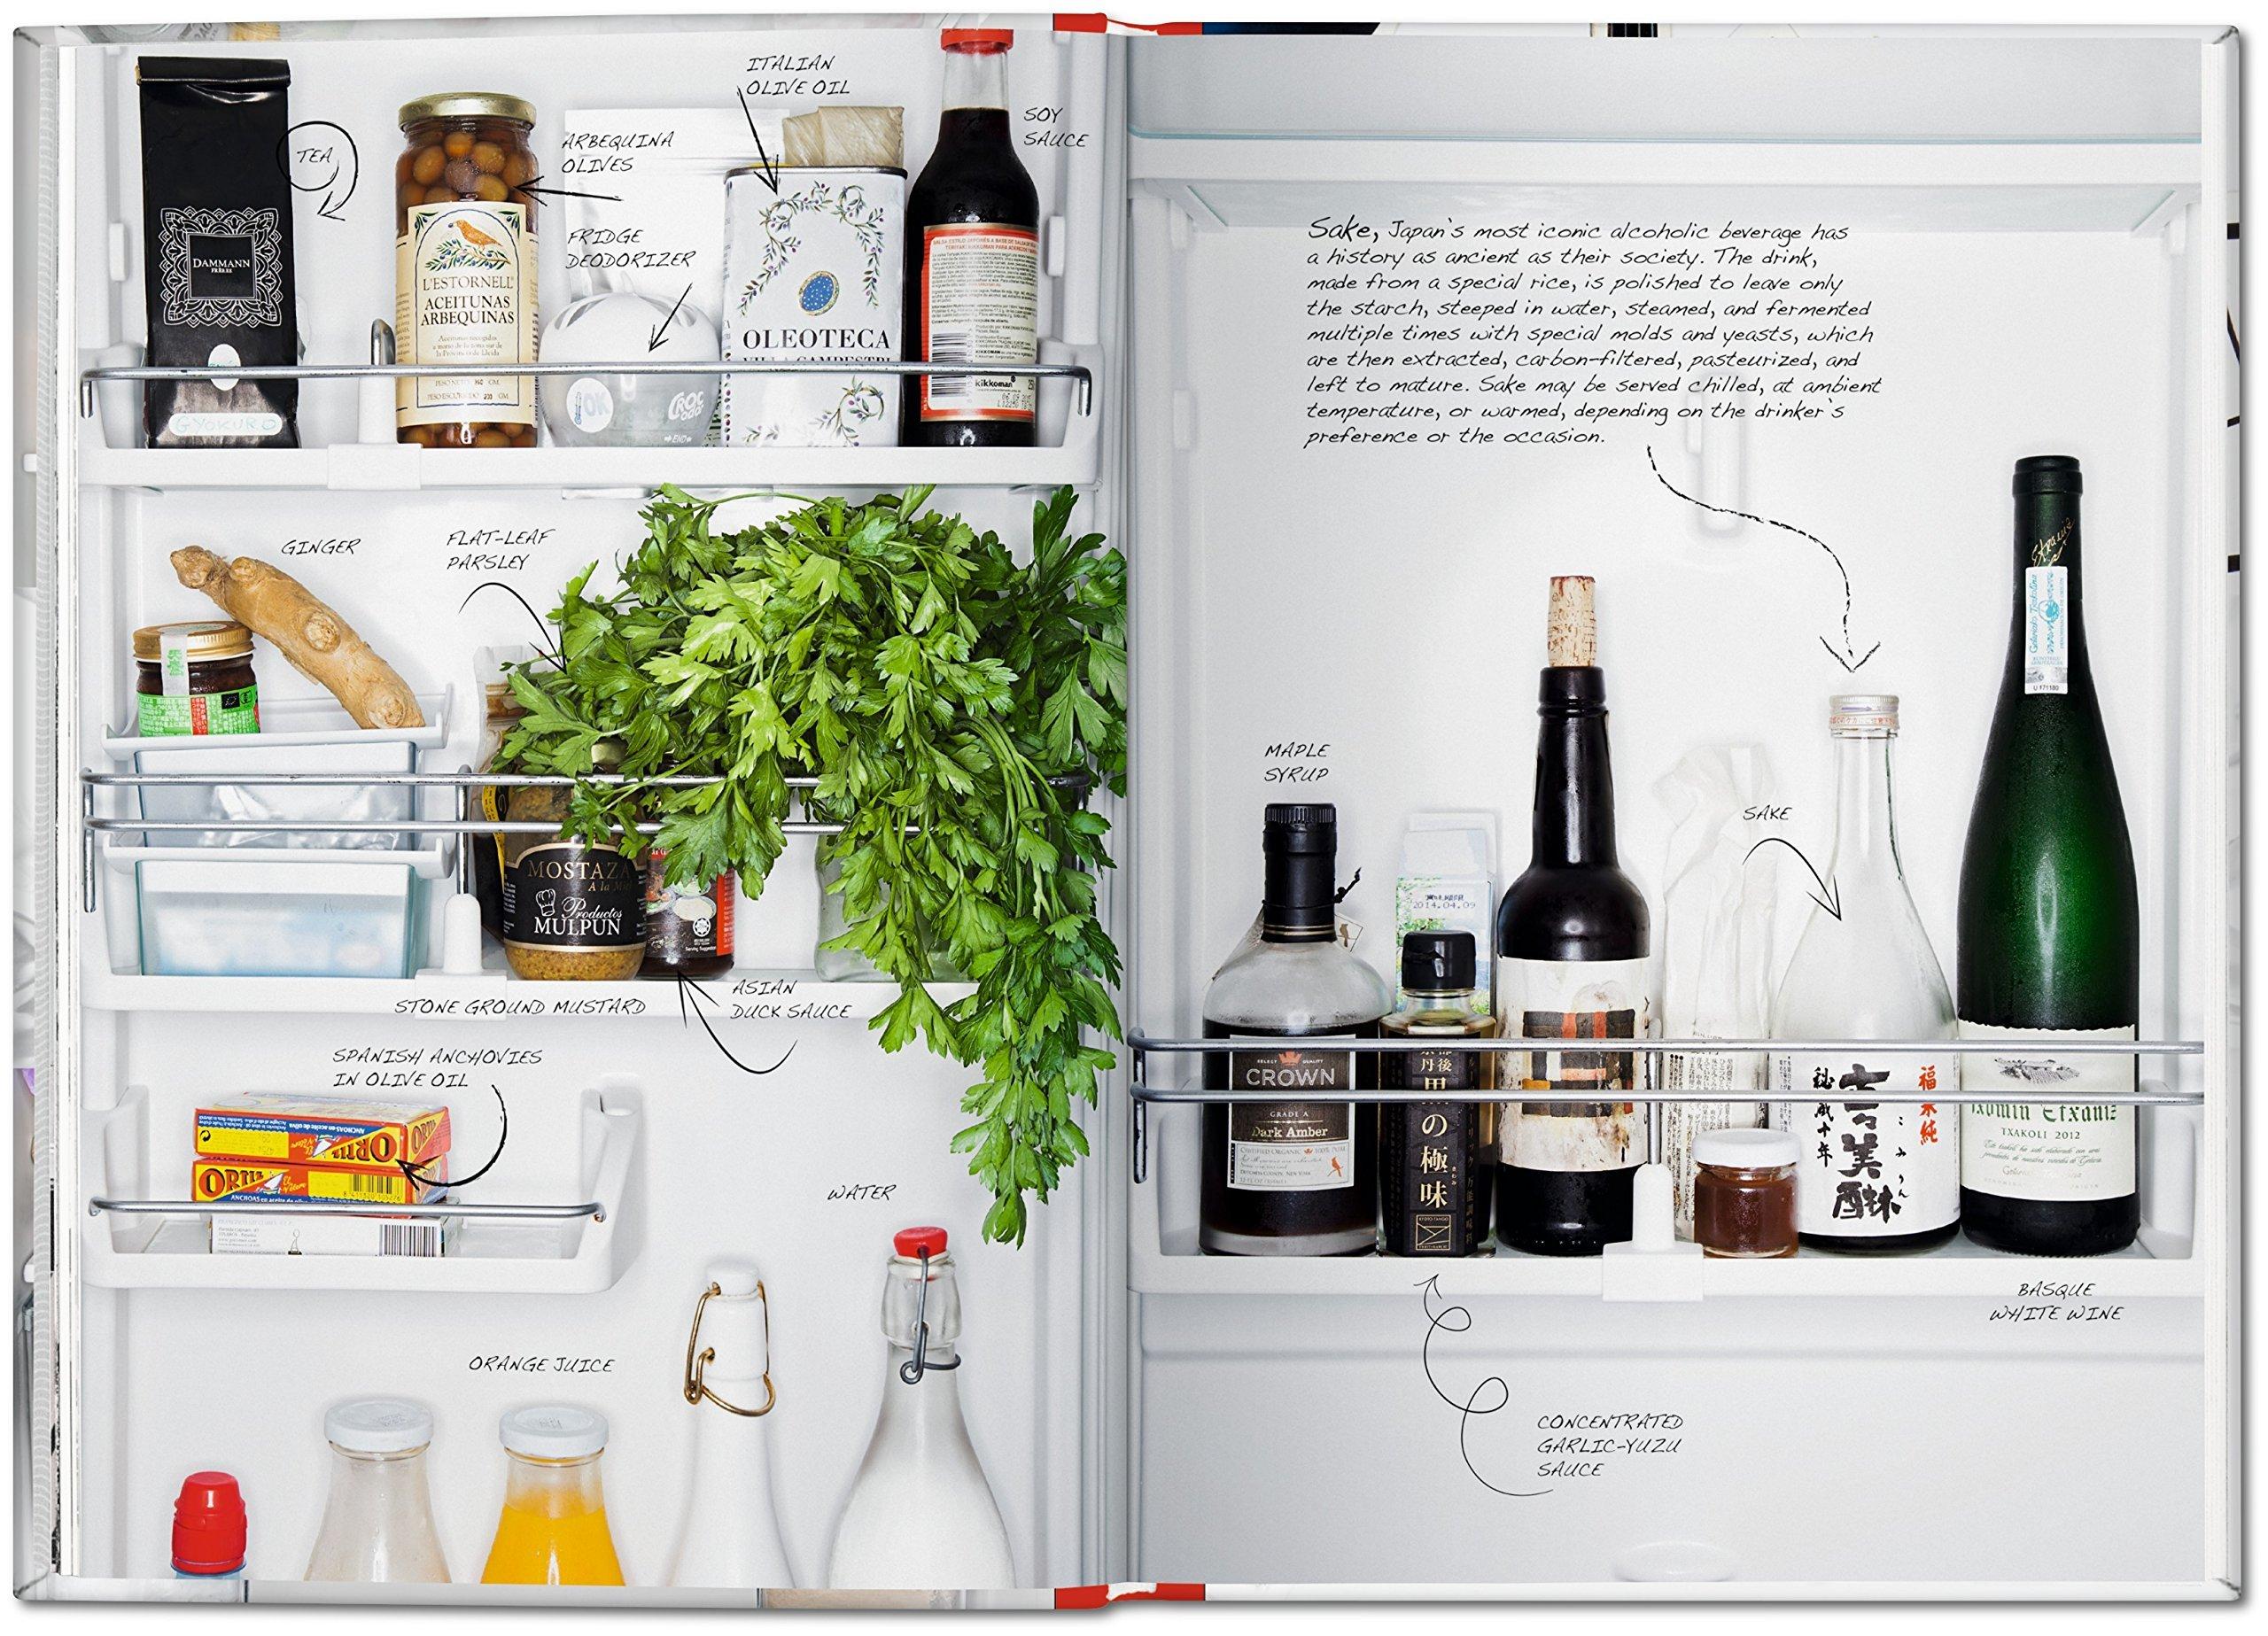 Inside a chefs fridge